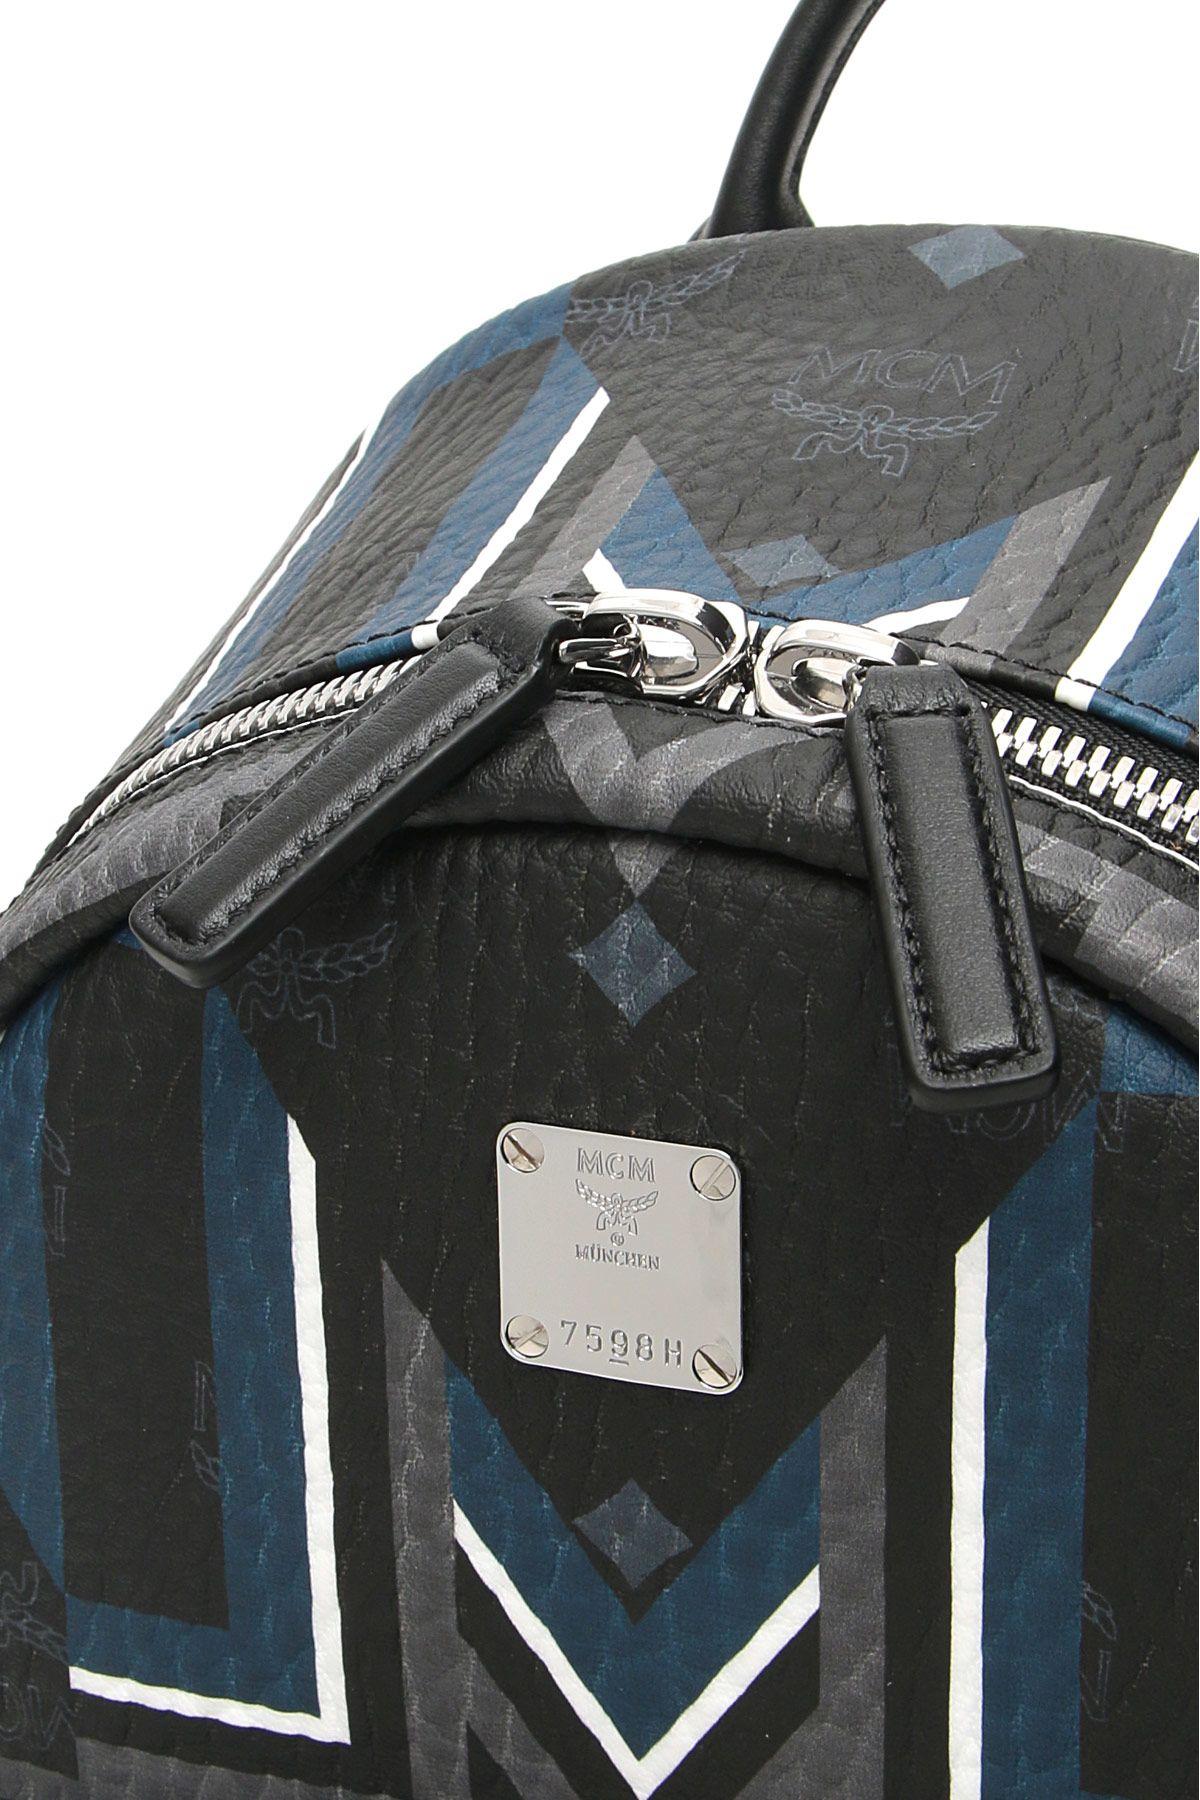 Mcm Backpacks Italist Always Like A Sale